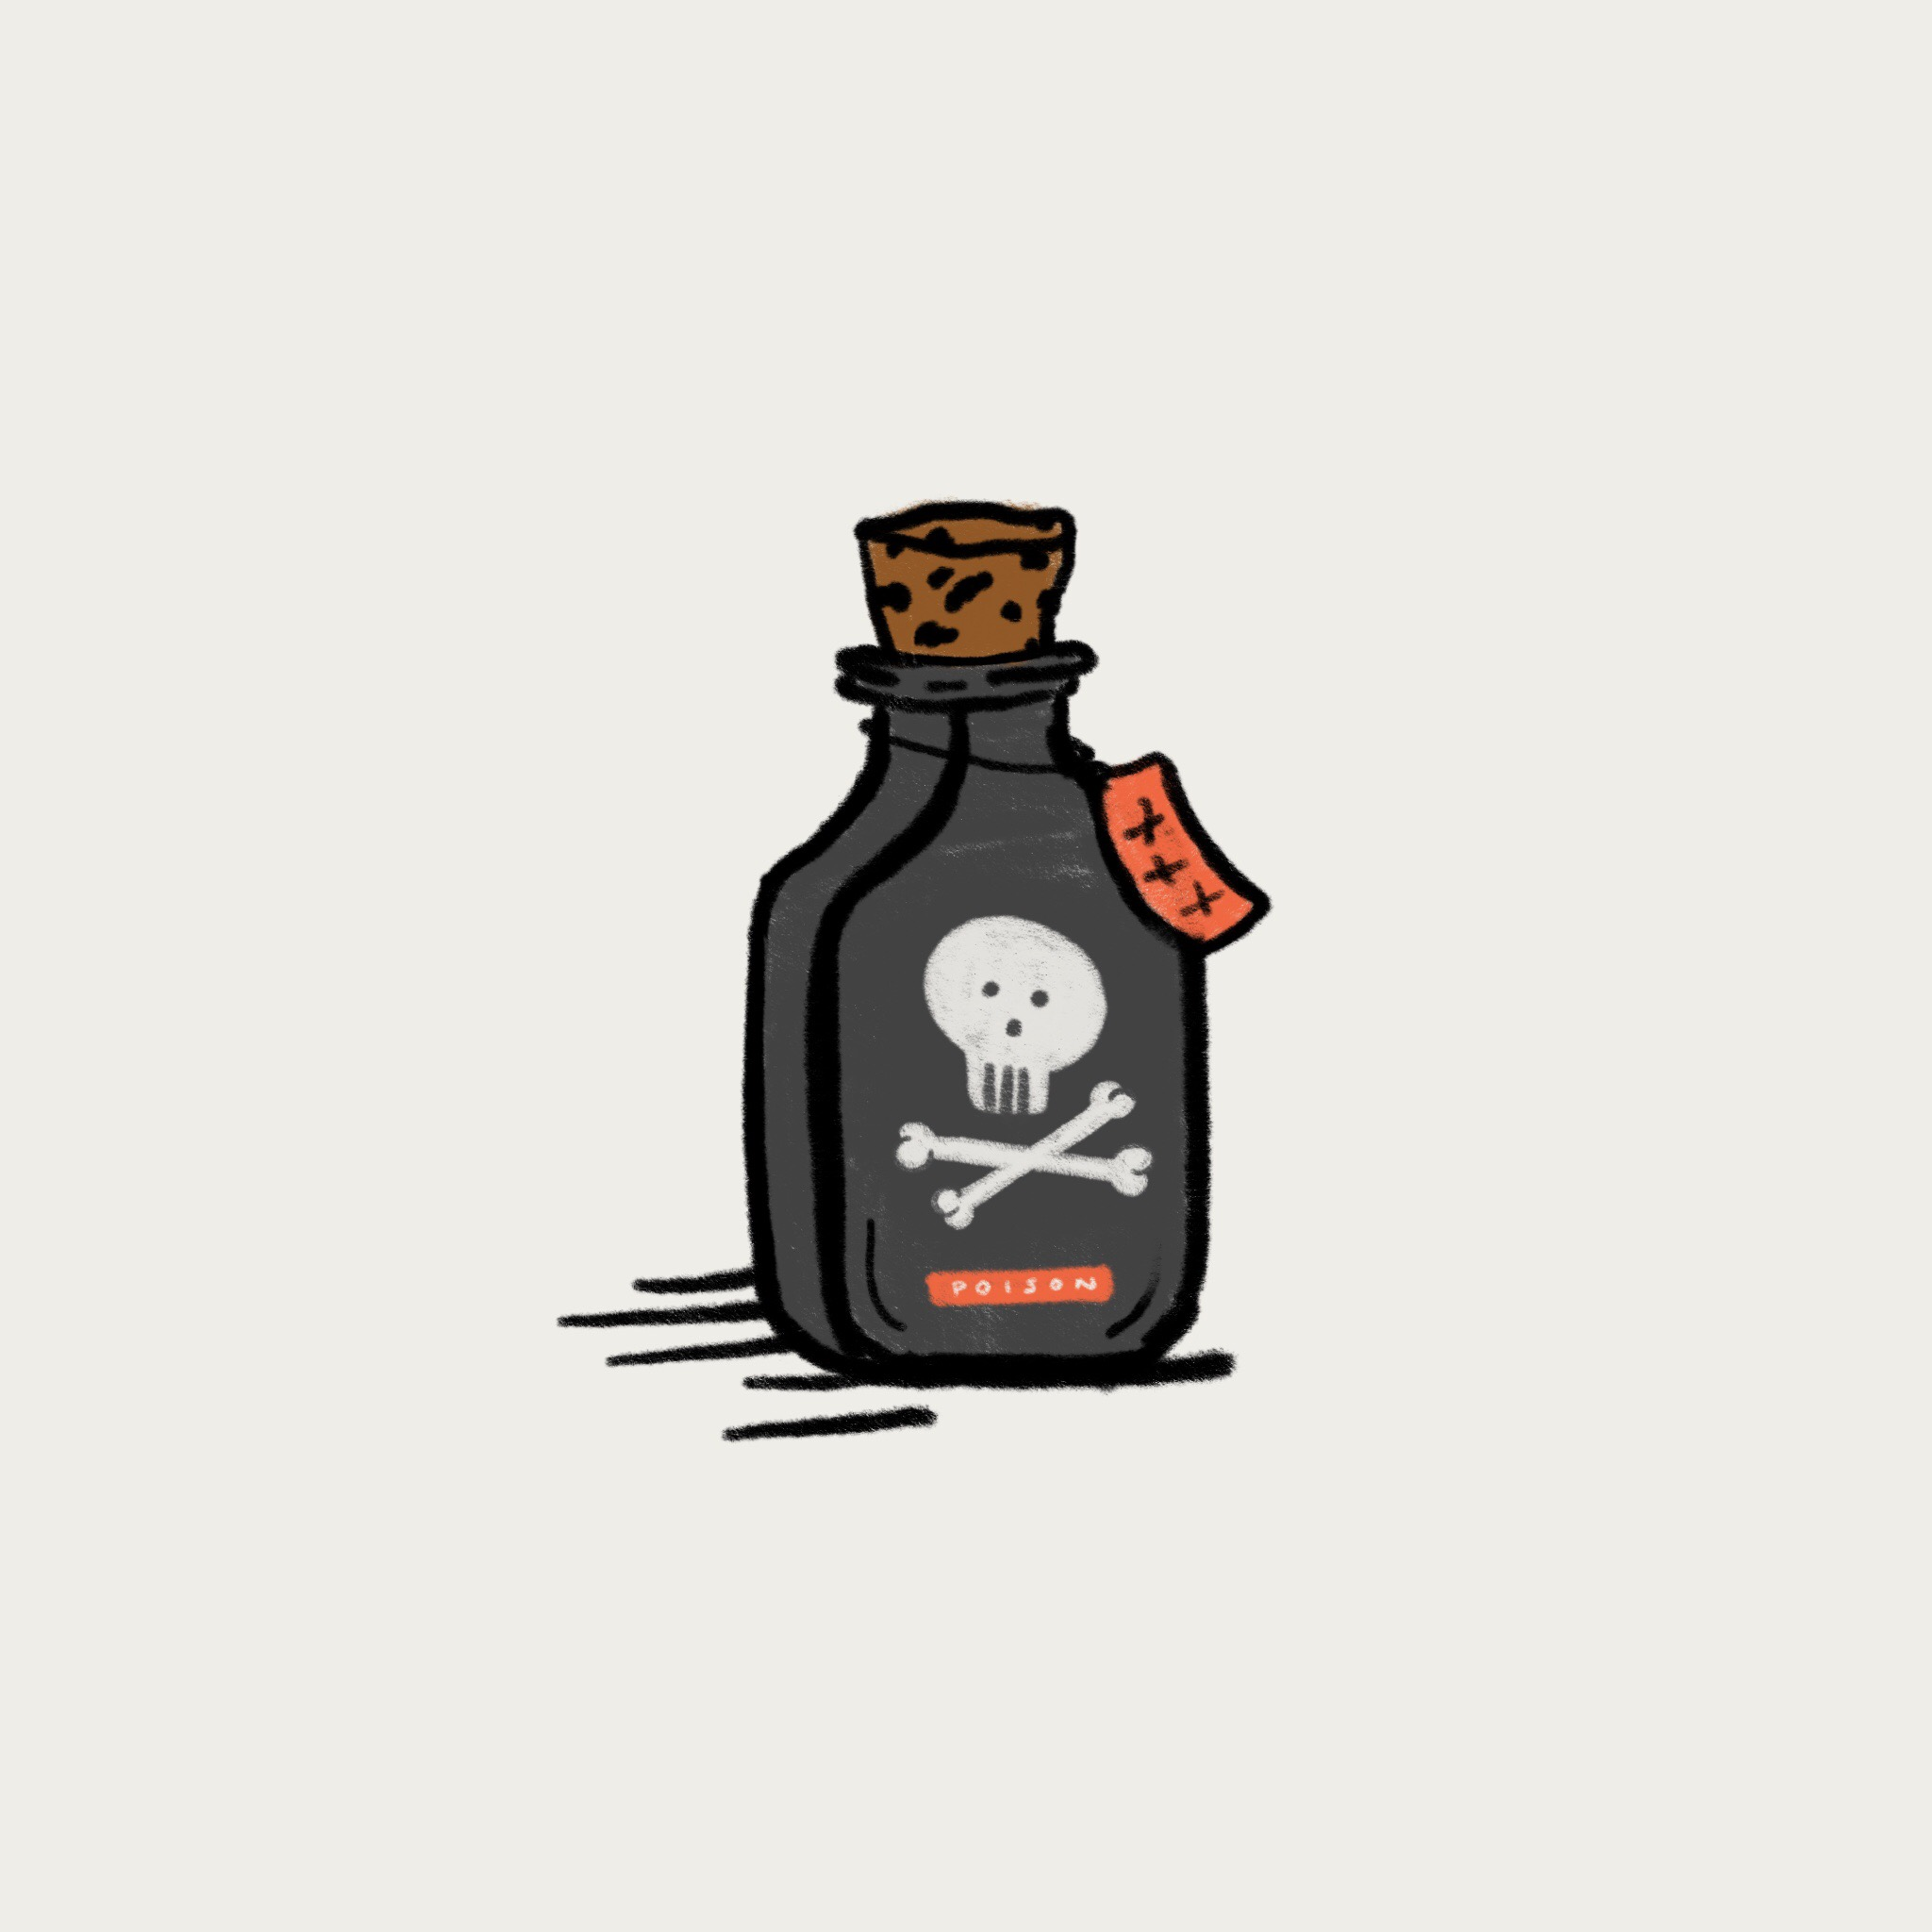 Poison, 10.3